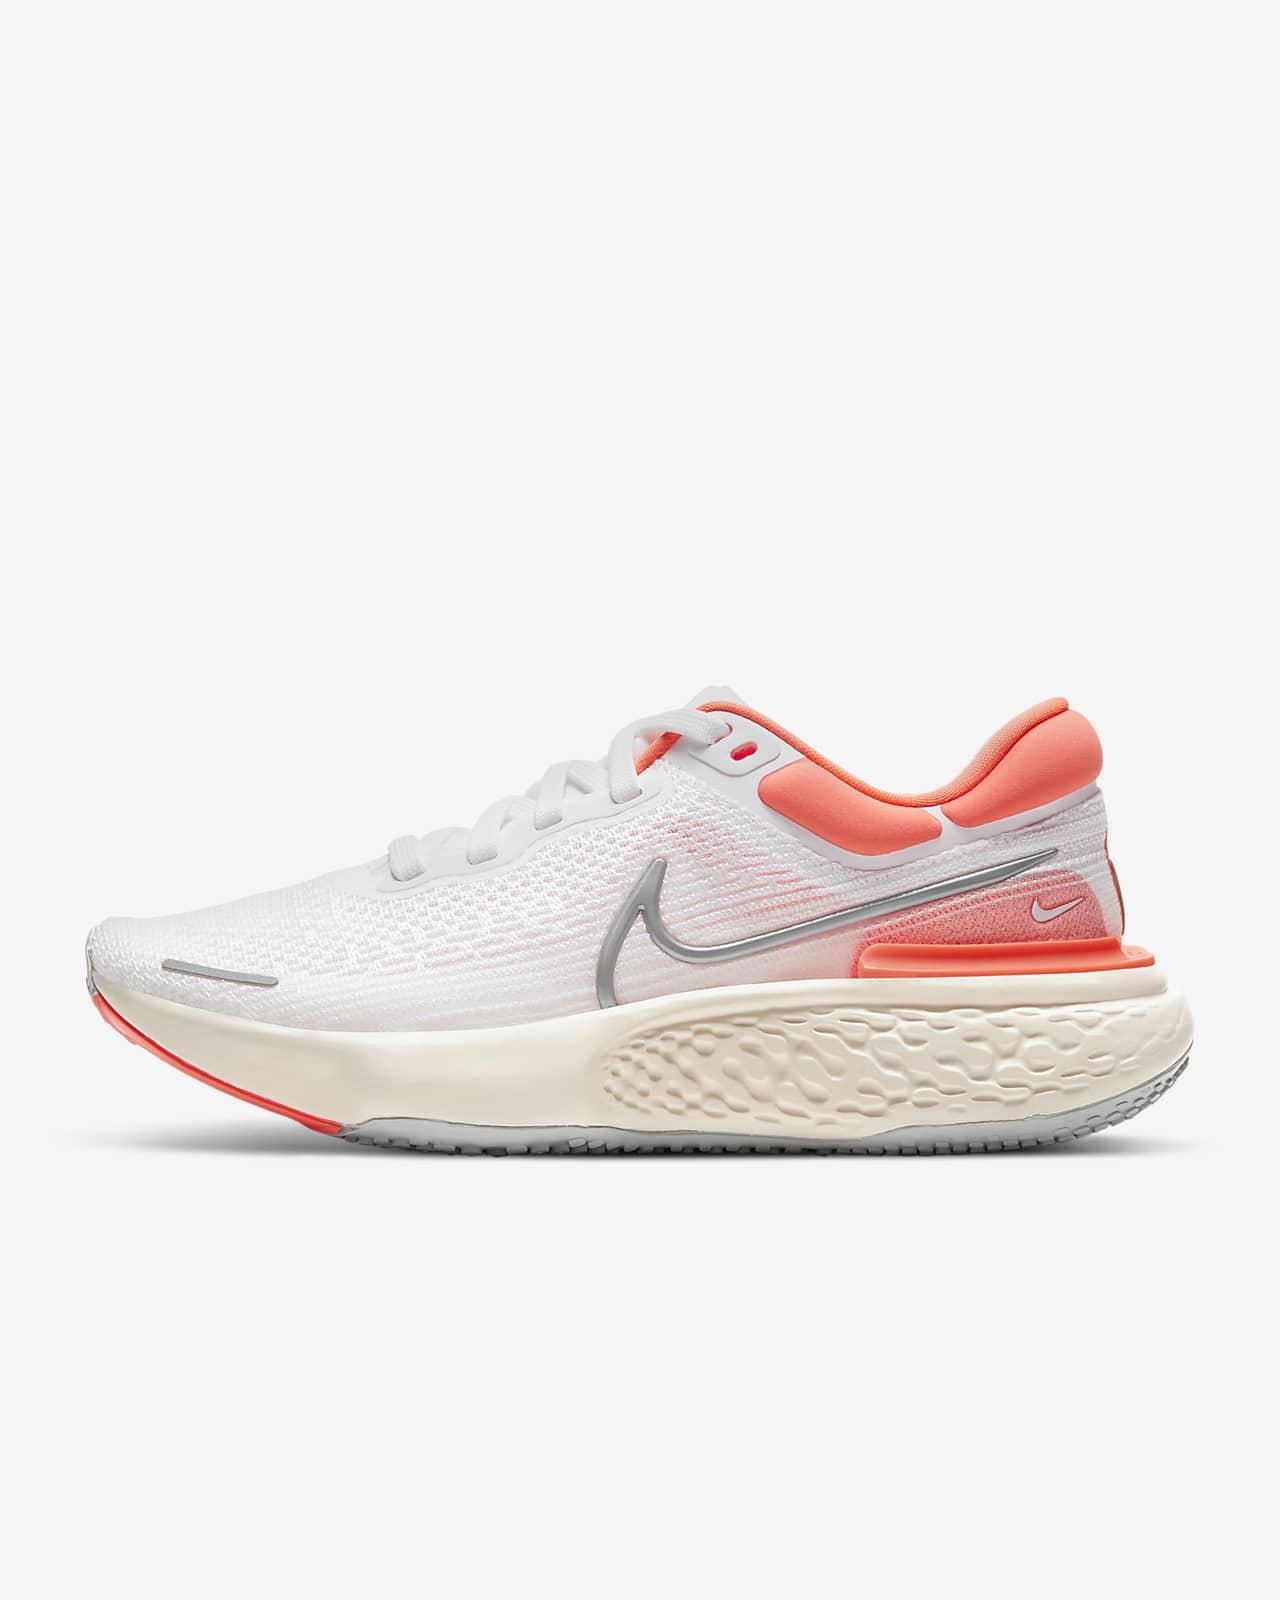 Женские кроссовки для бега по шоссе Nike ZoomX Invincible Run Flyknit